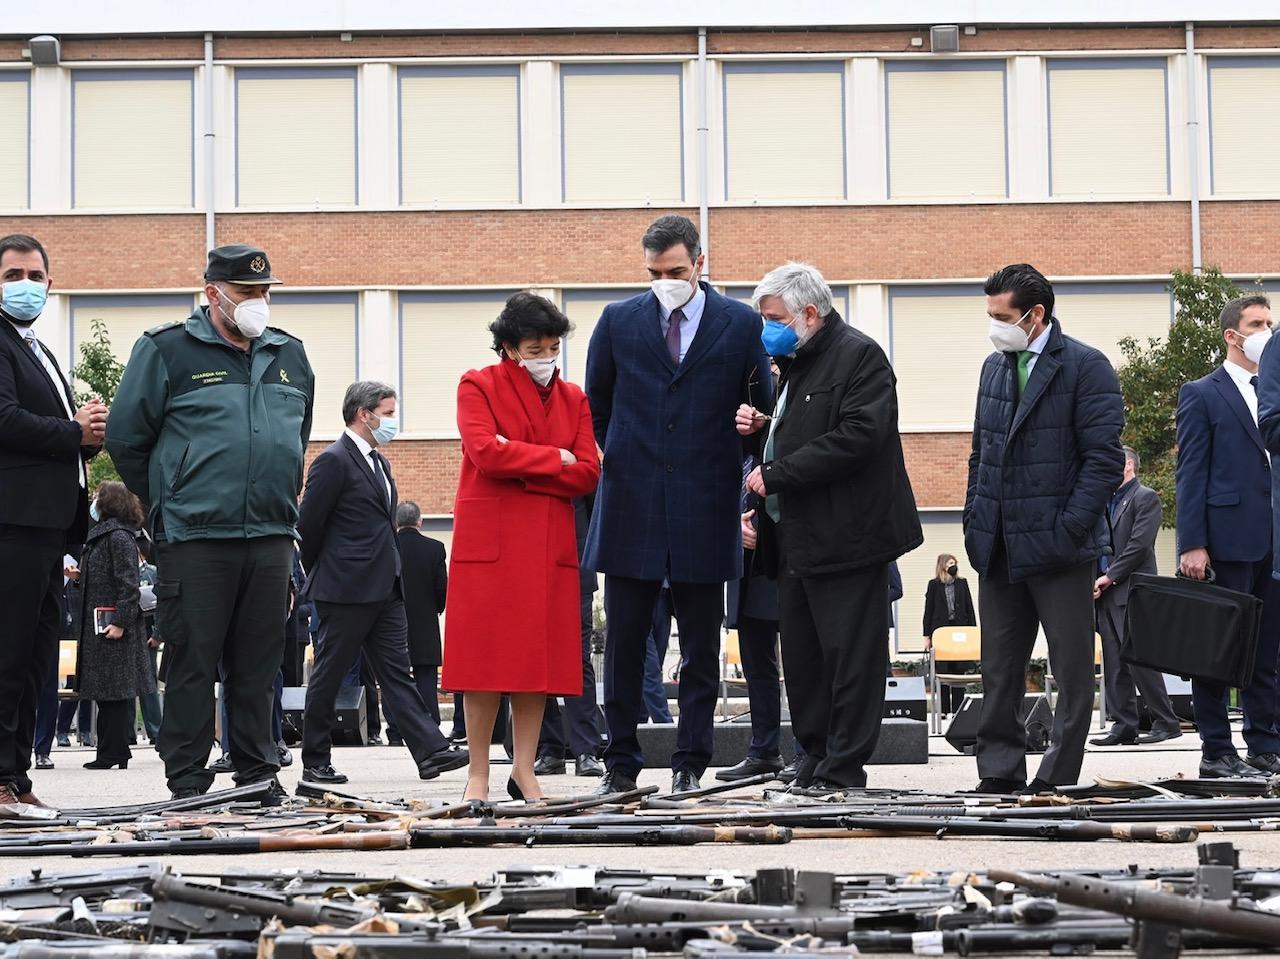 La Foto De La Derrota Del Terrorismo En Un Colegio De La Guardia Civil